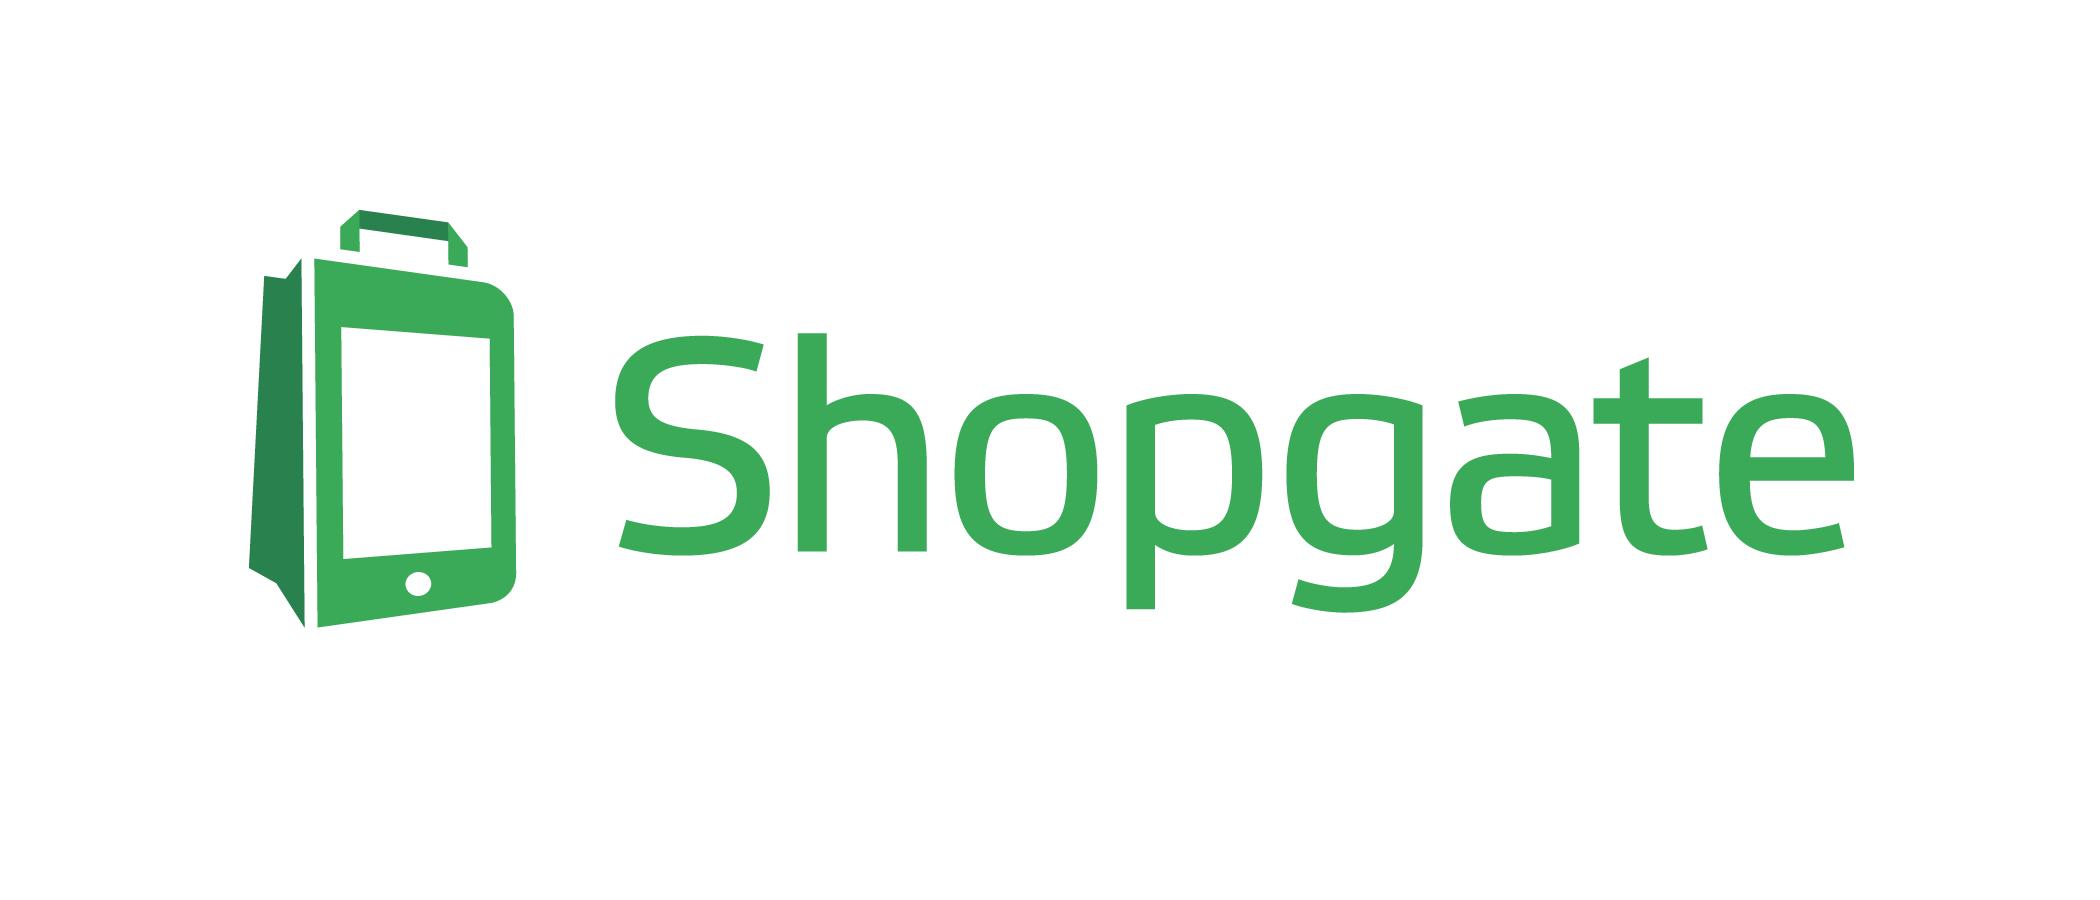 Shopgate company logo